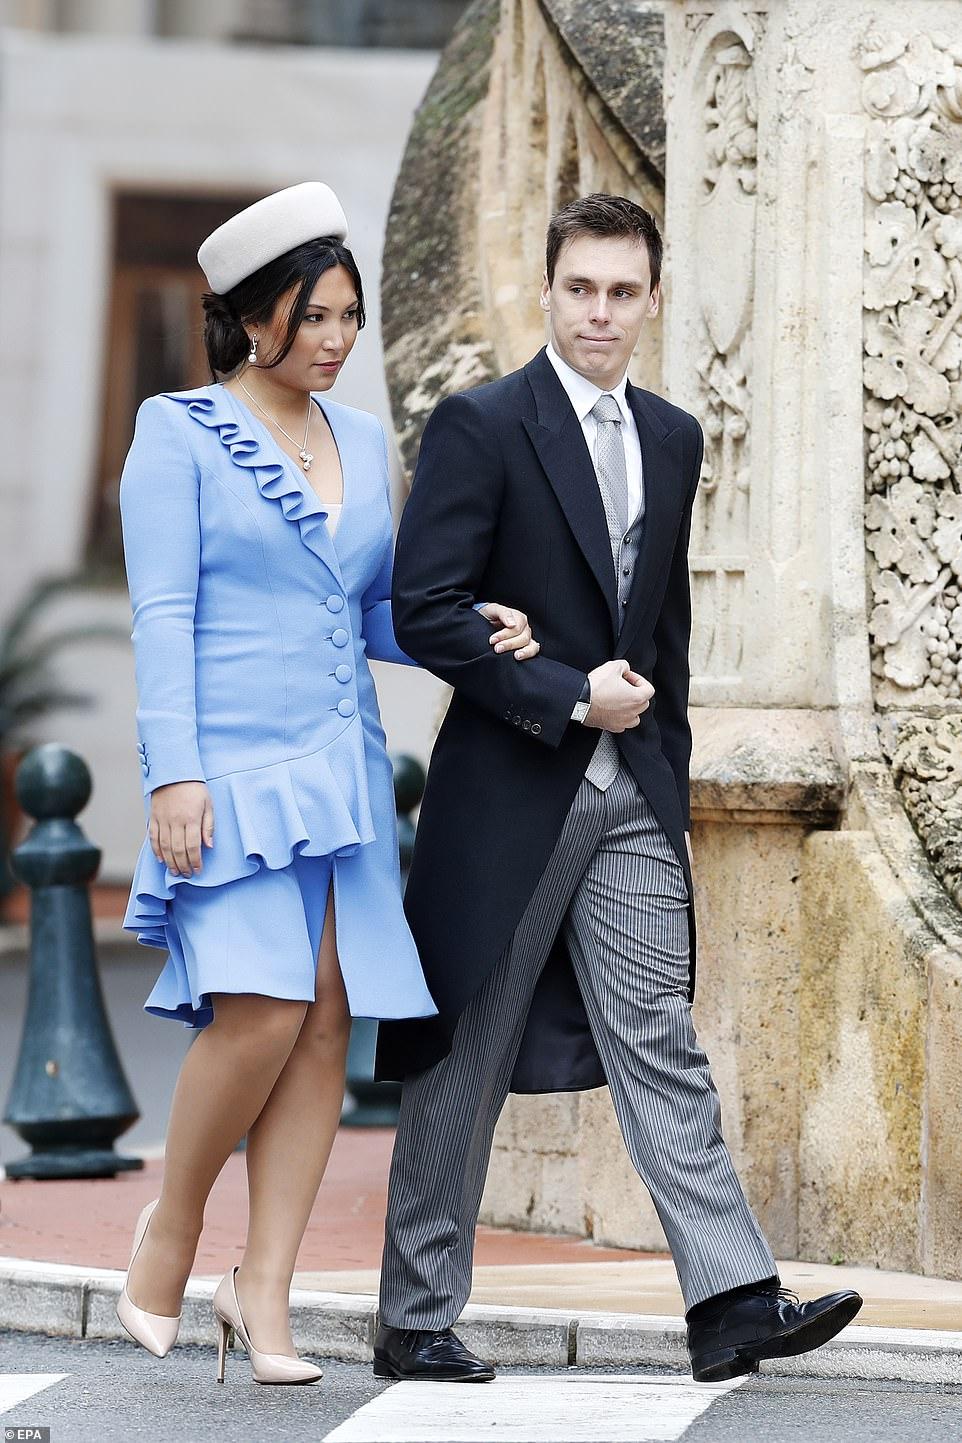 Louis Ducruet (R) and partner Marie Hoa Chevallier (L) attend the celebrations